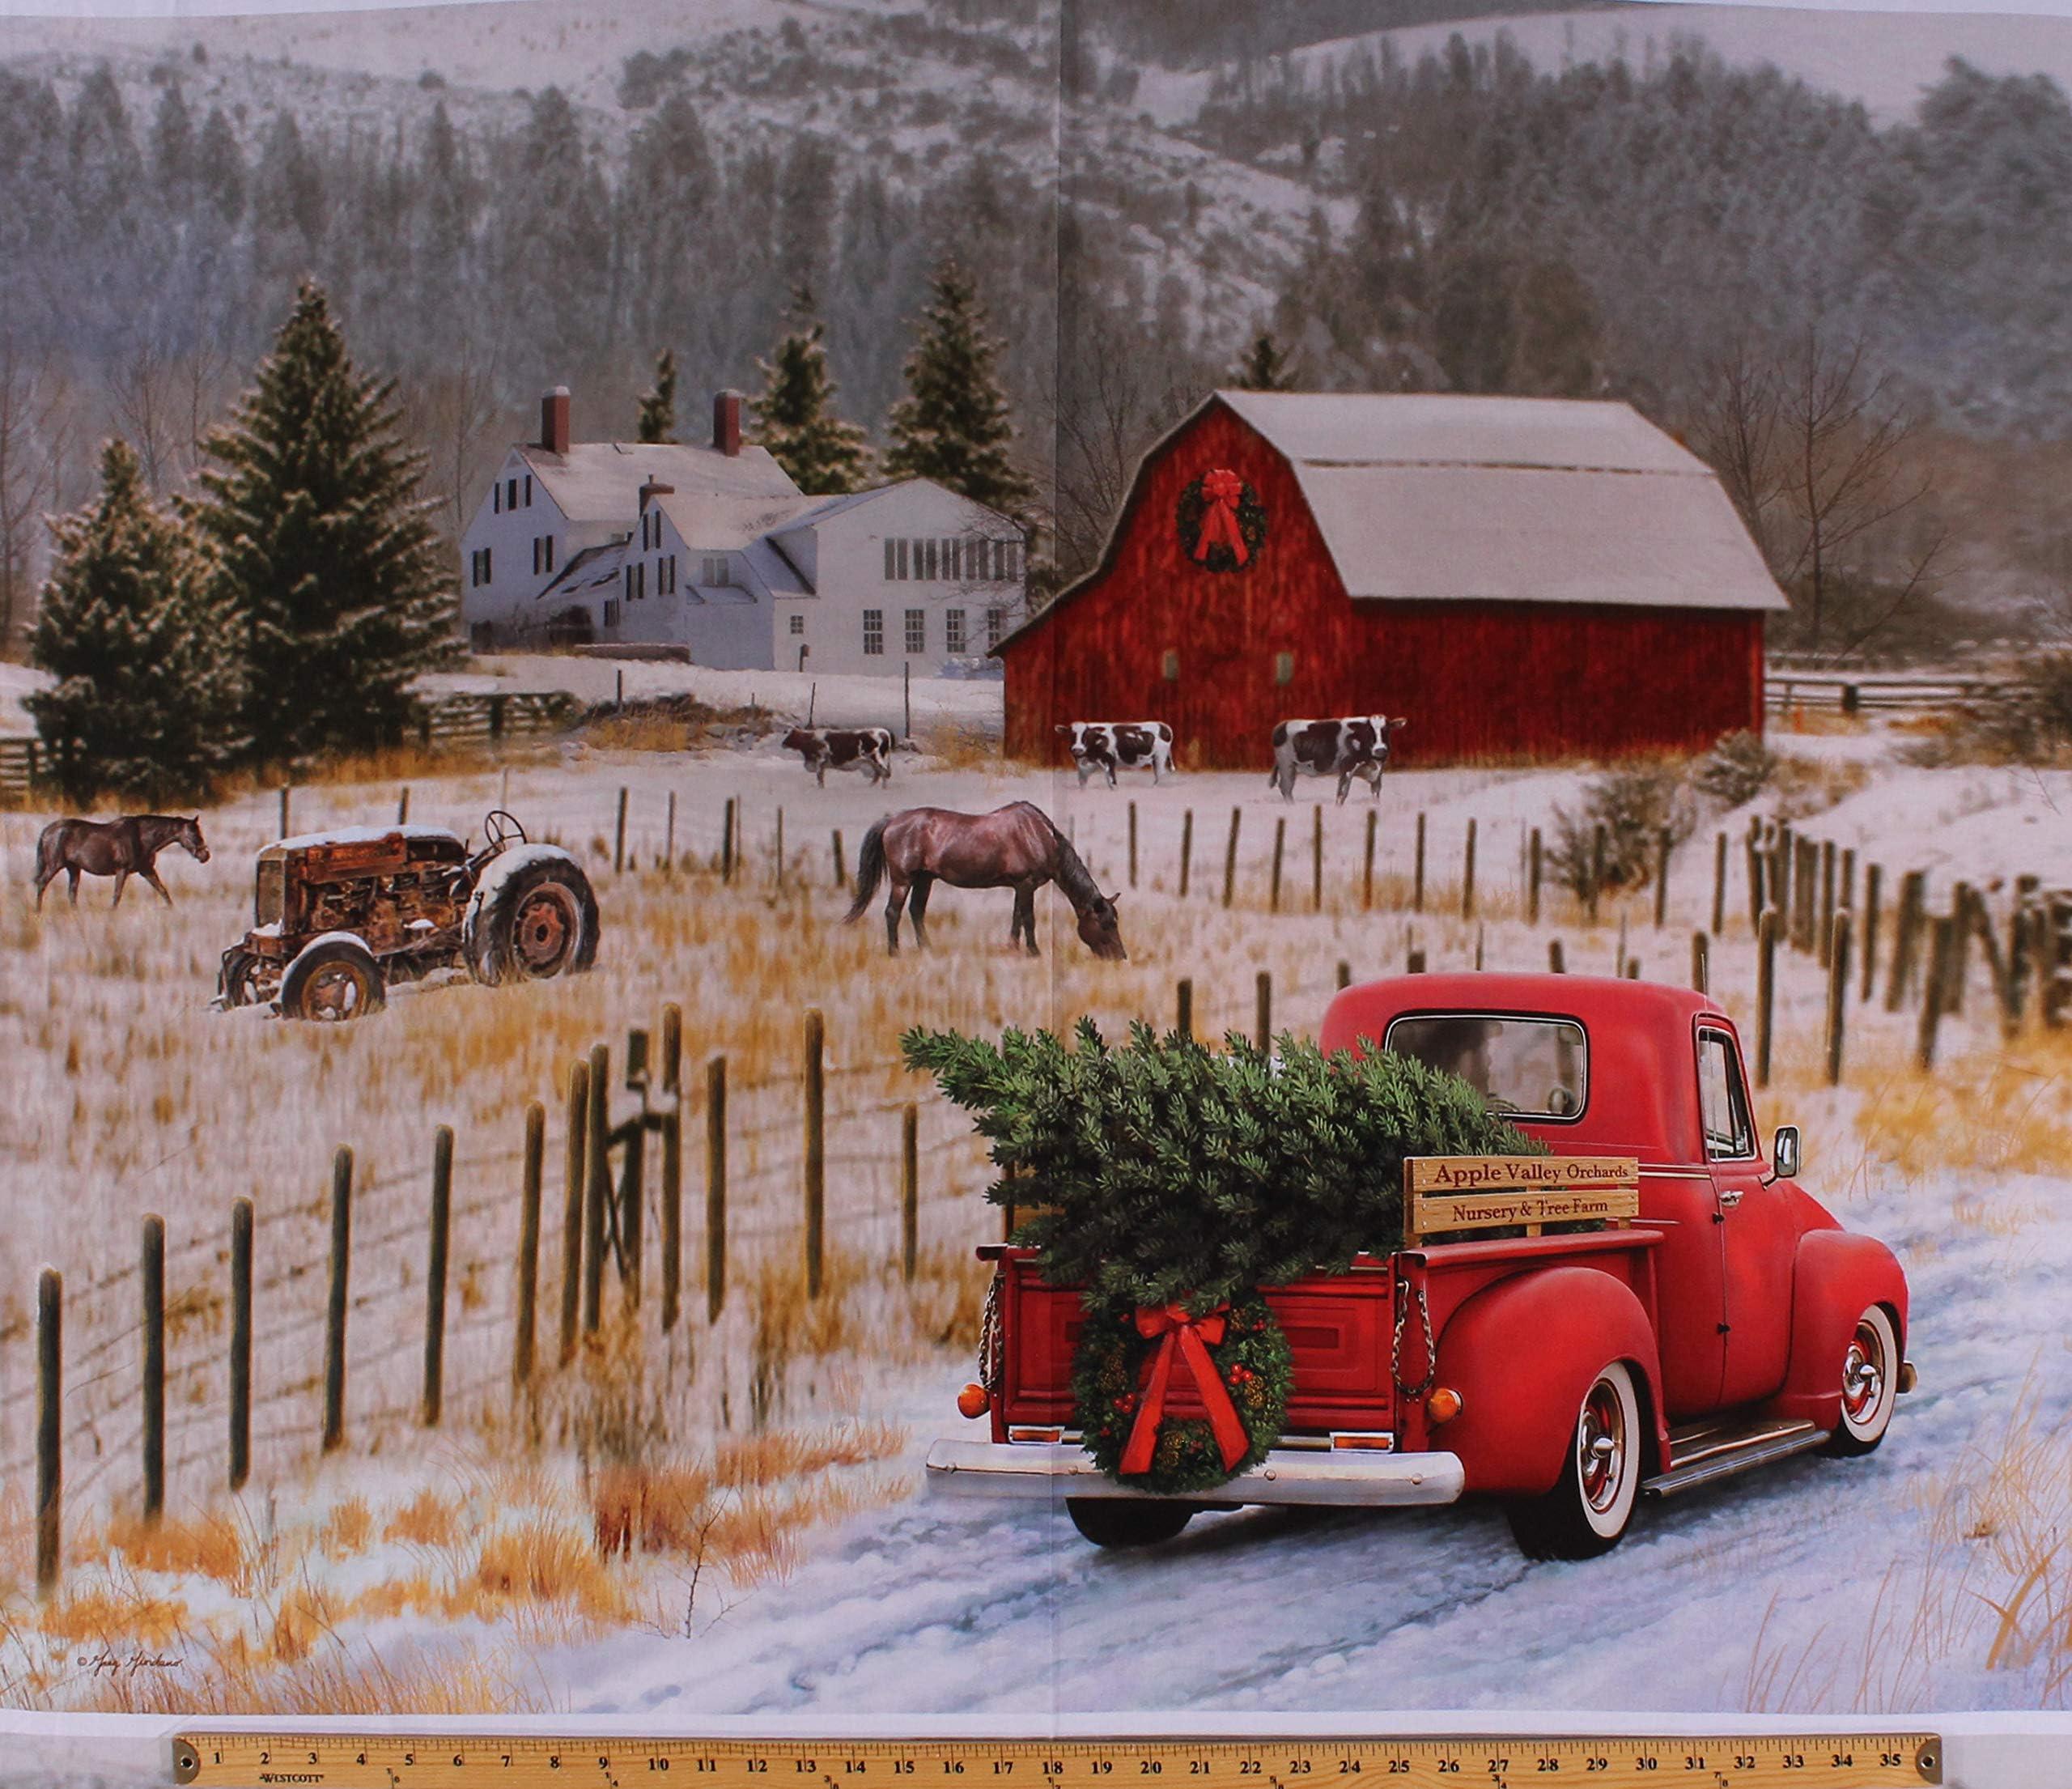 Rustic Christmas Panel Red Christmas Truck Fabric Rustic Red Truck Fabric Rustic Christmas Fabric Country Christmas Fabric